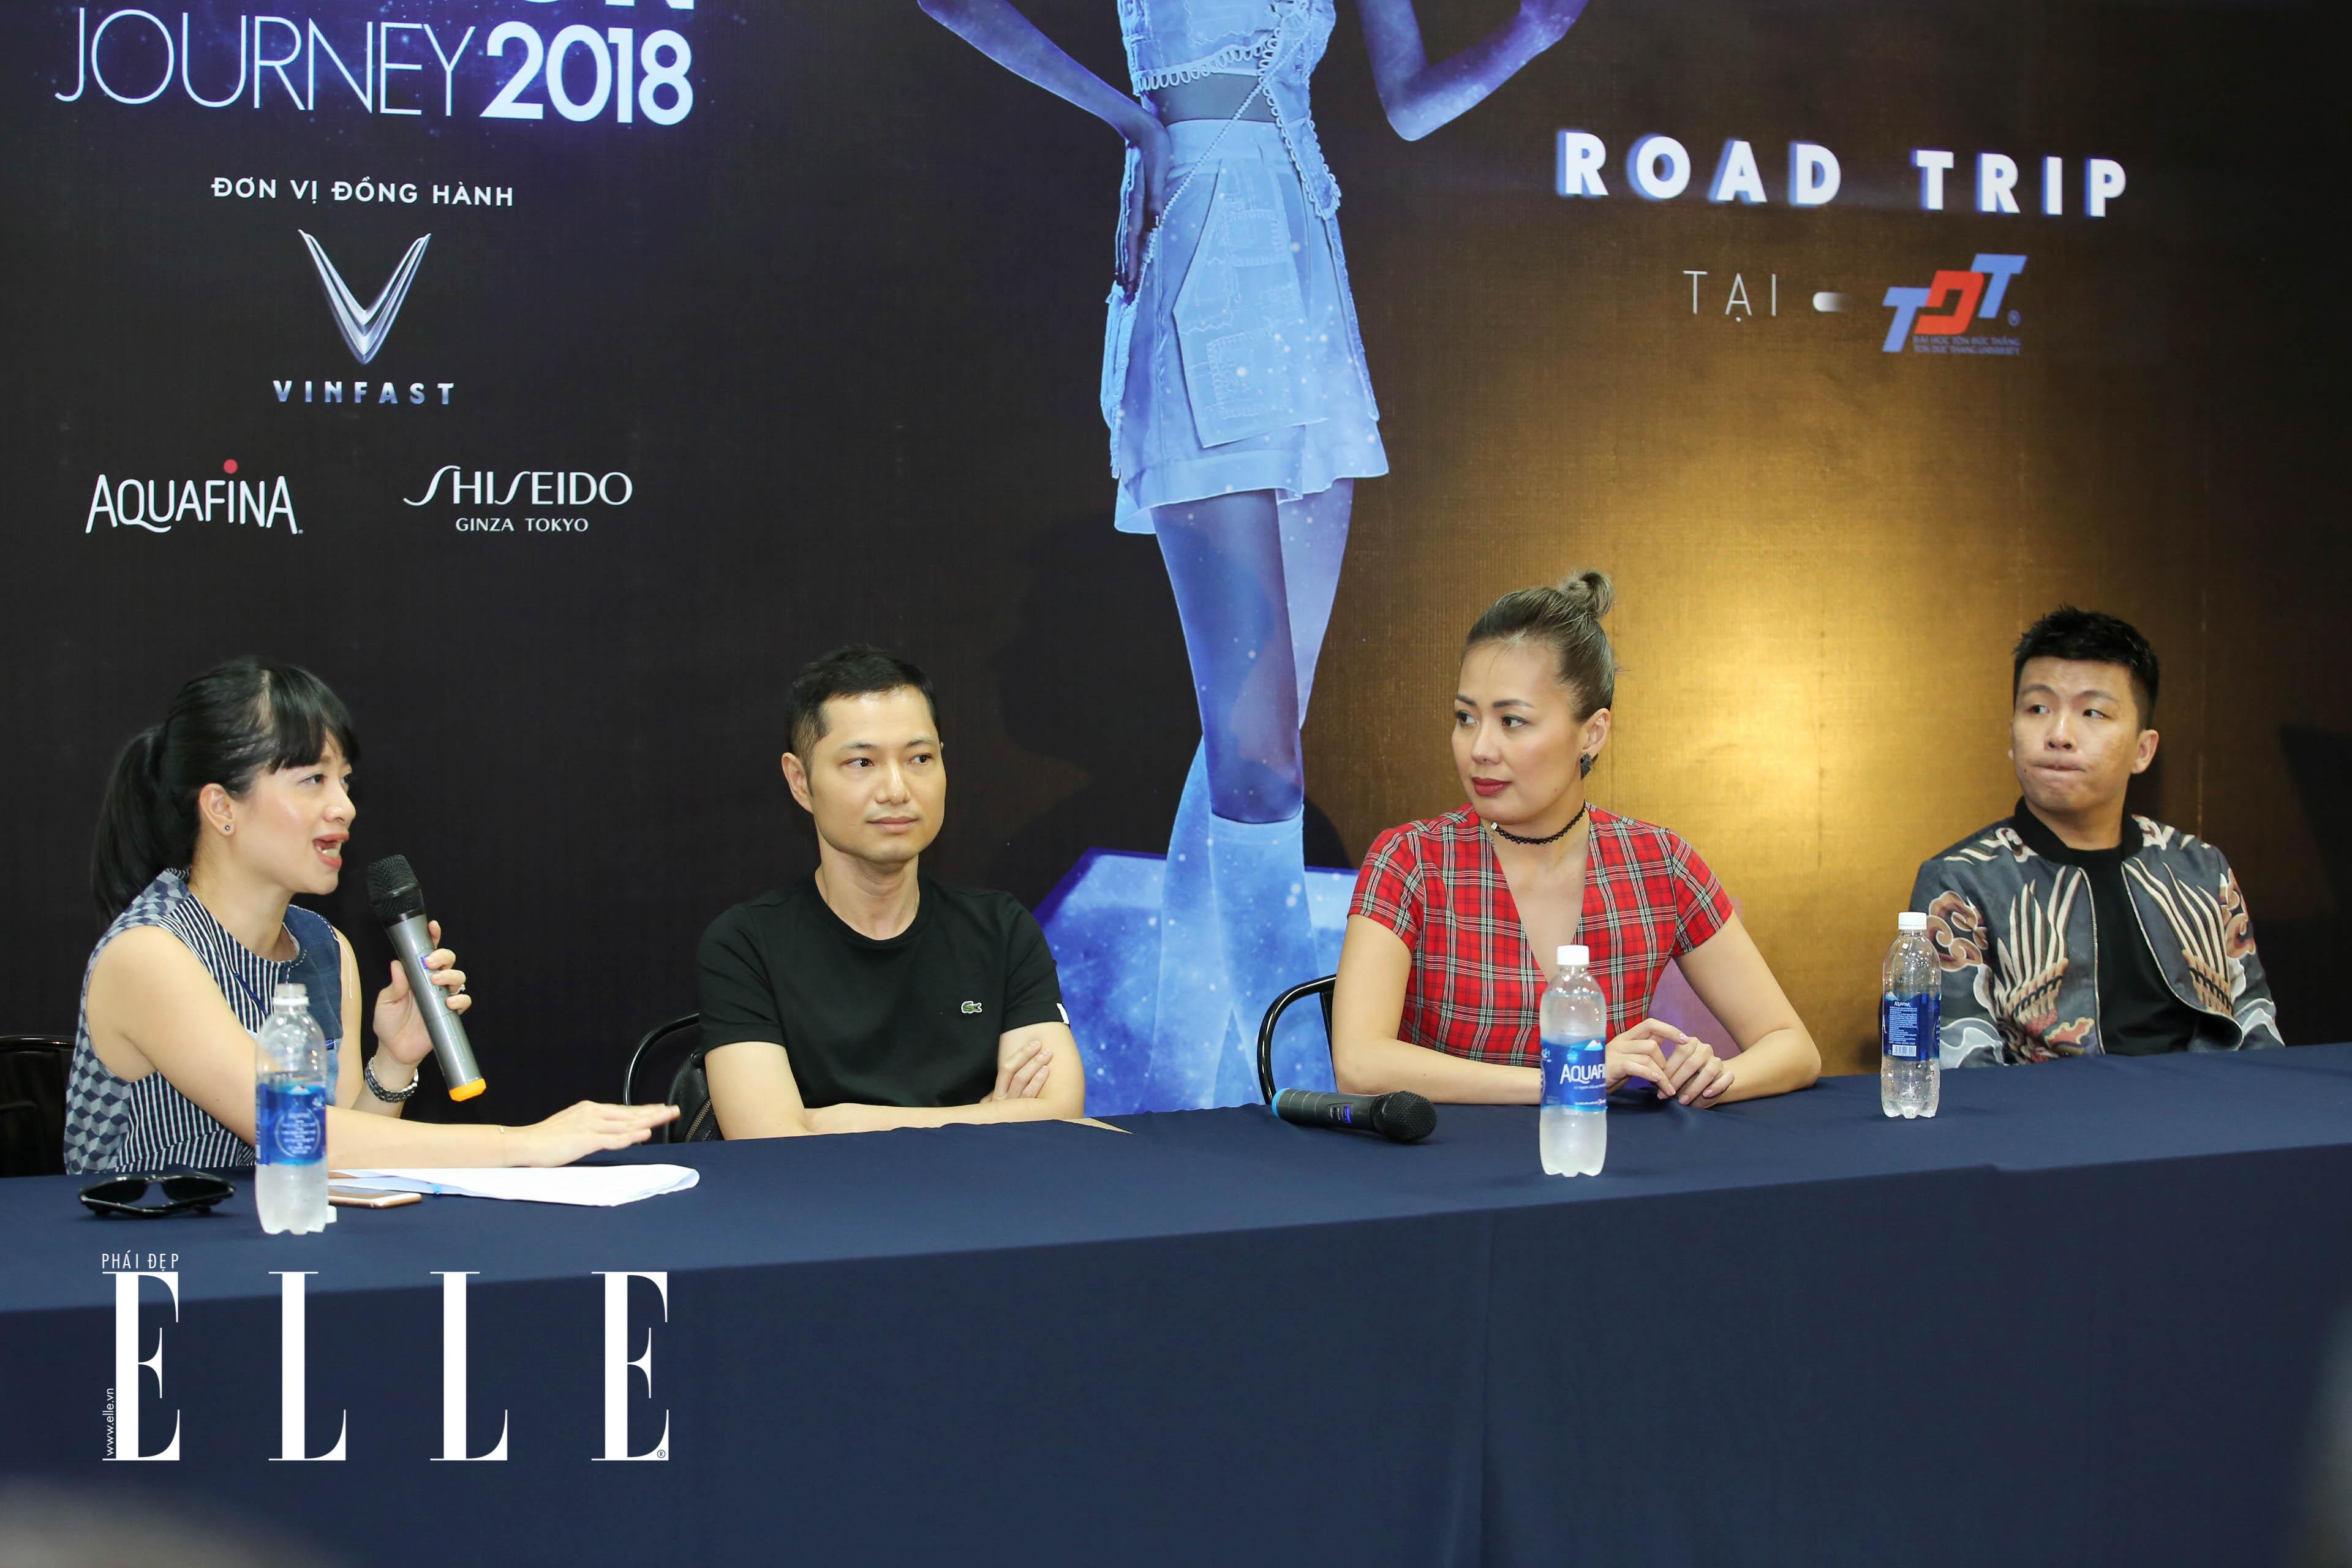 elle fashion road trip 2018 - dai hoc ton duc thang - elle man11